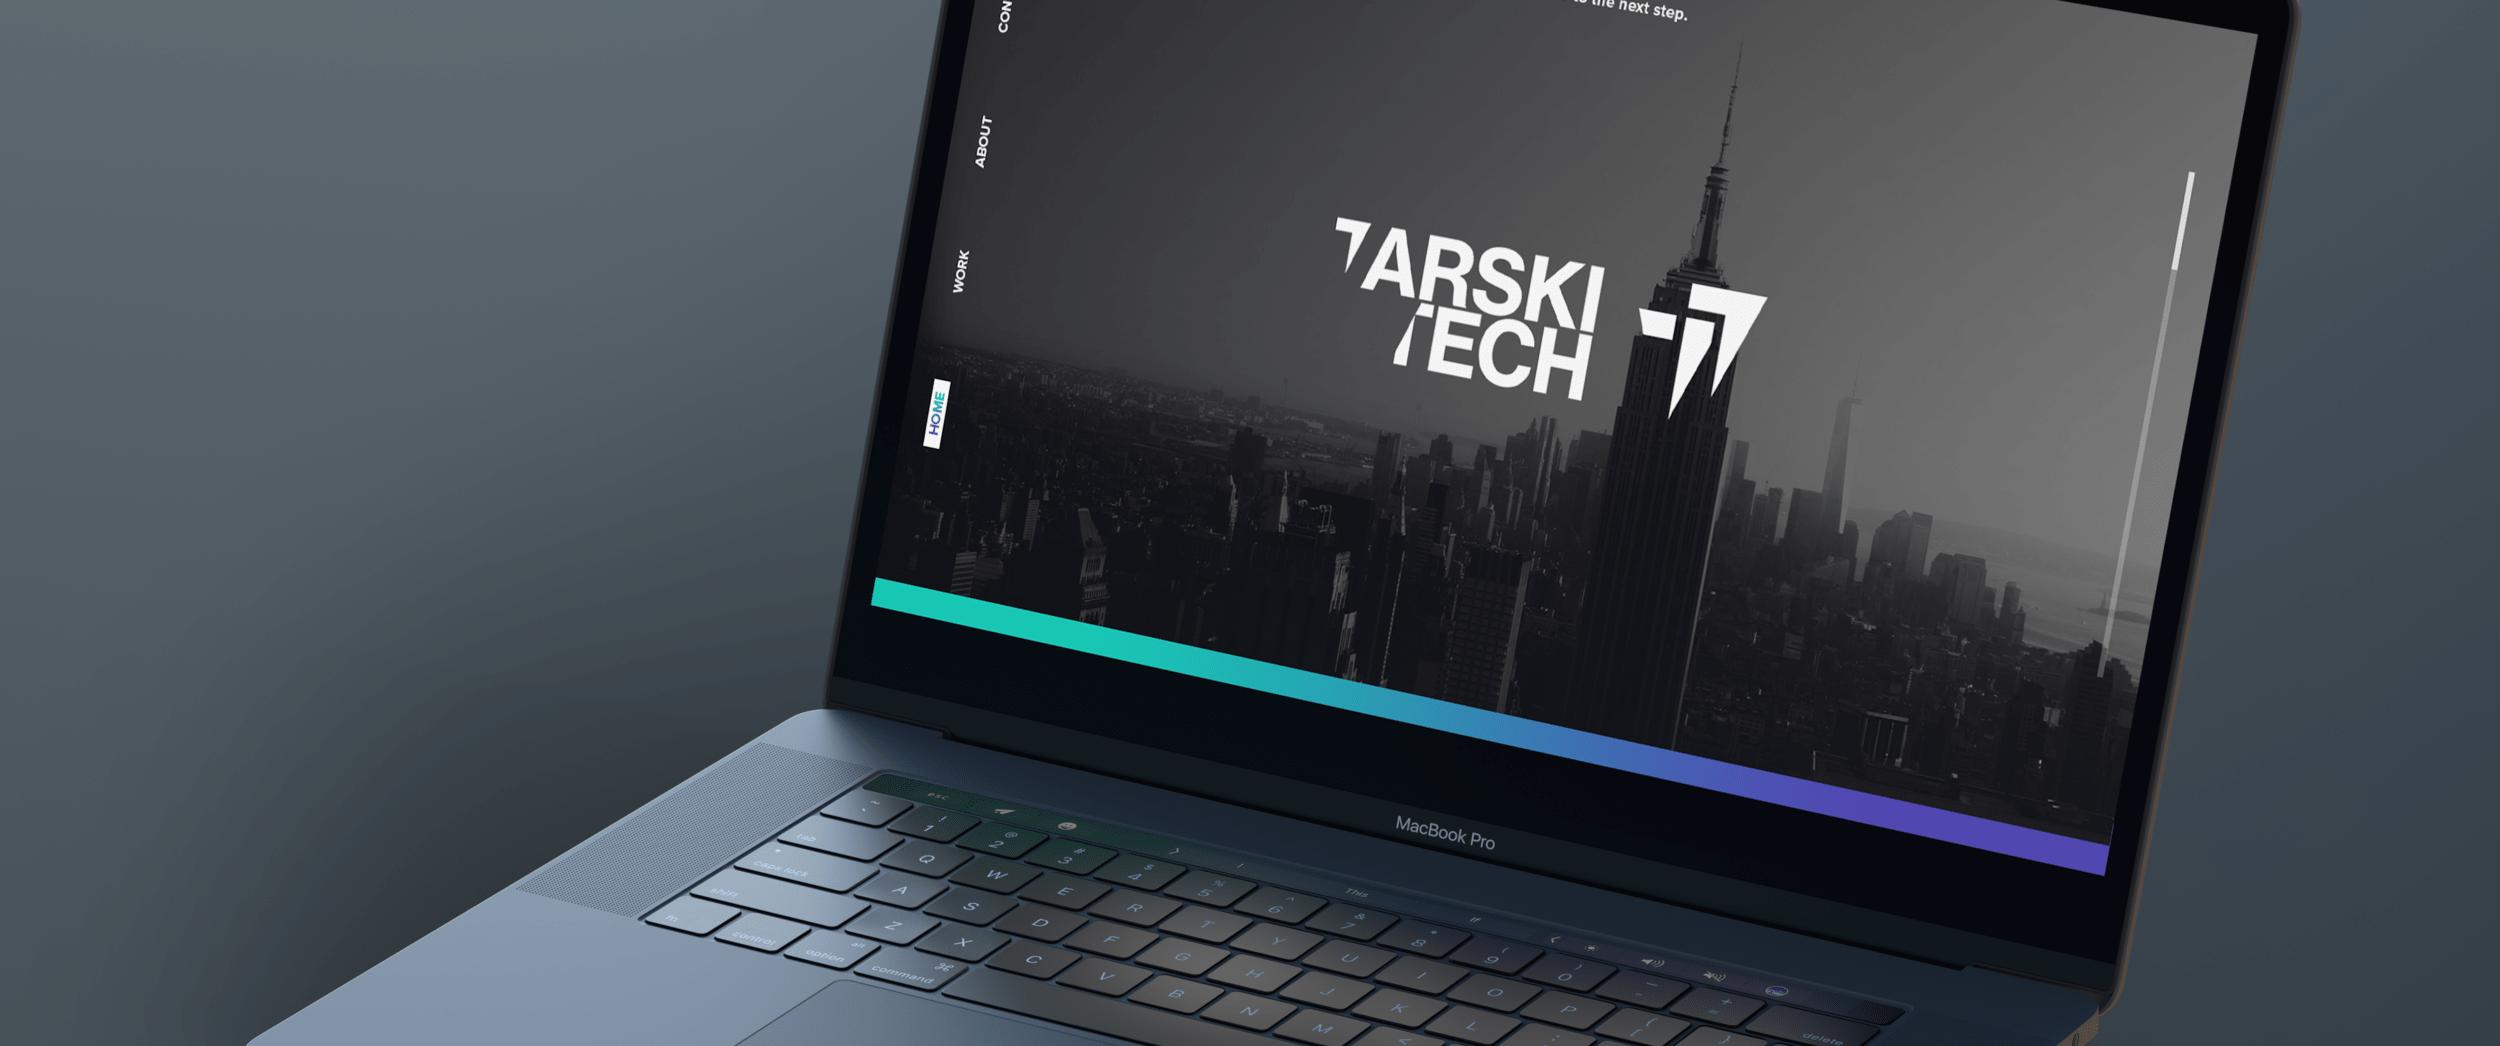 Tarski Tech